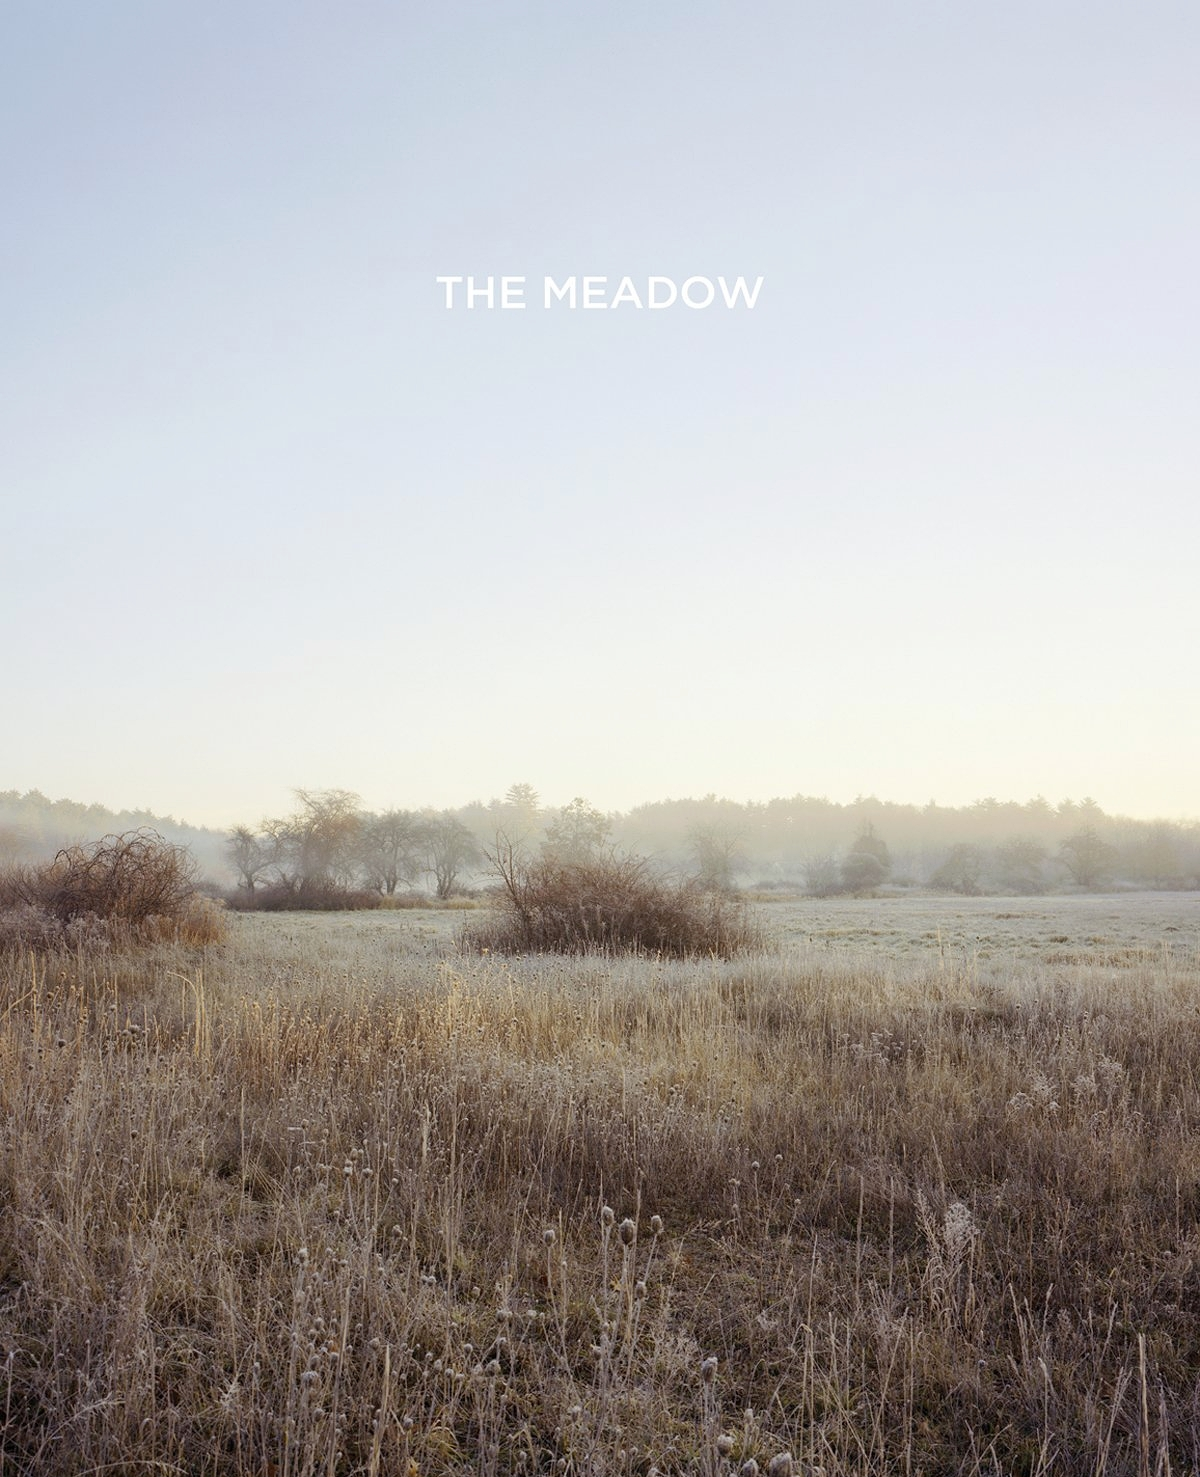 bosworth & kelley: the meadow